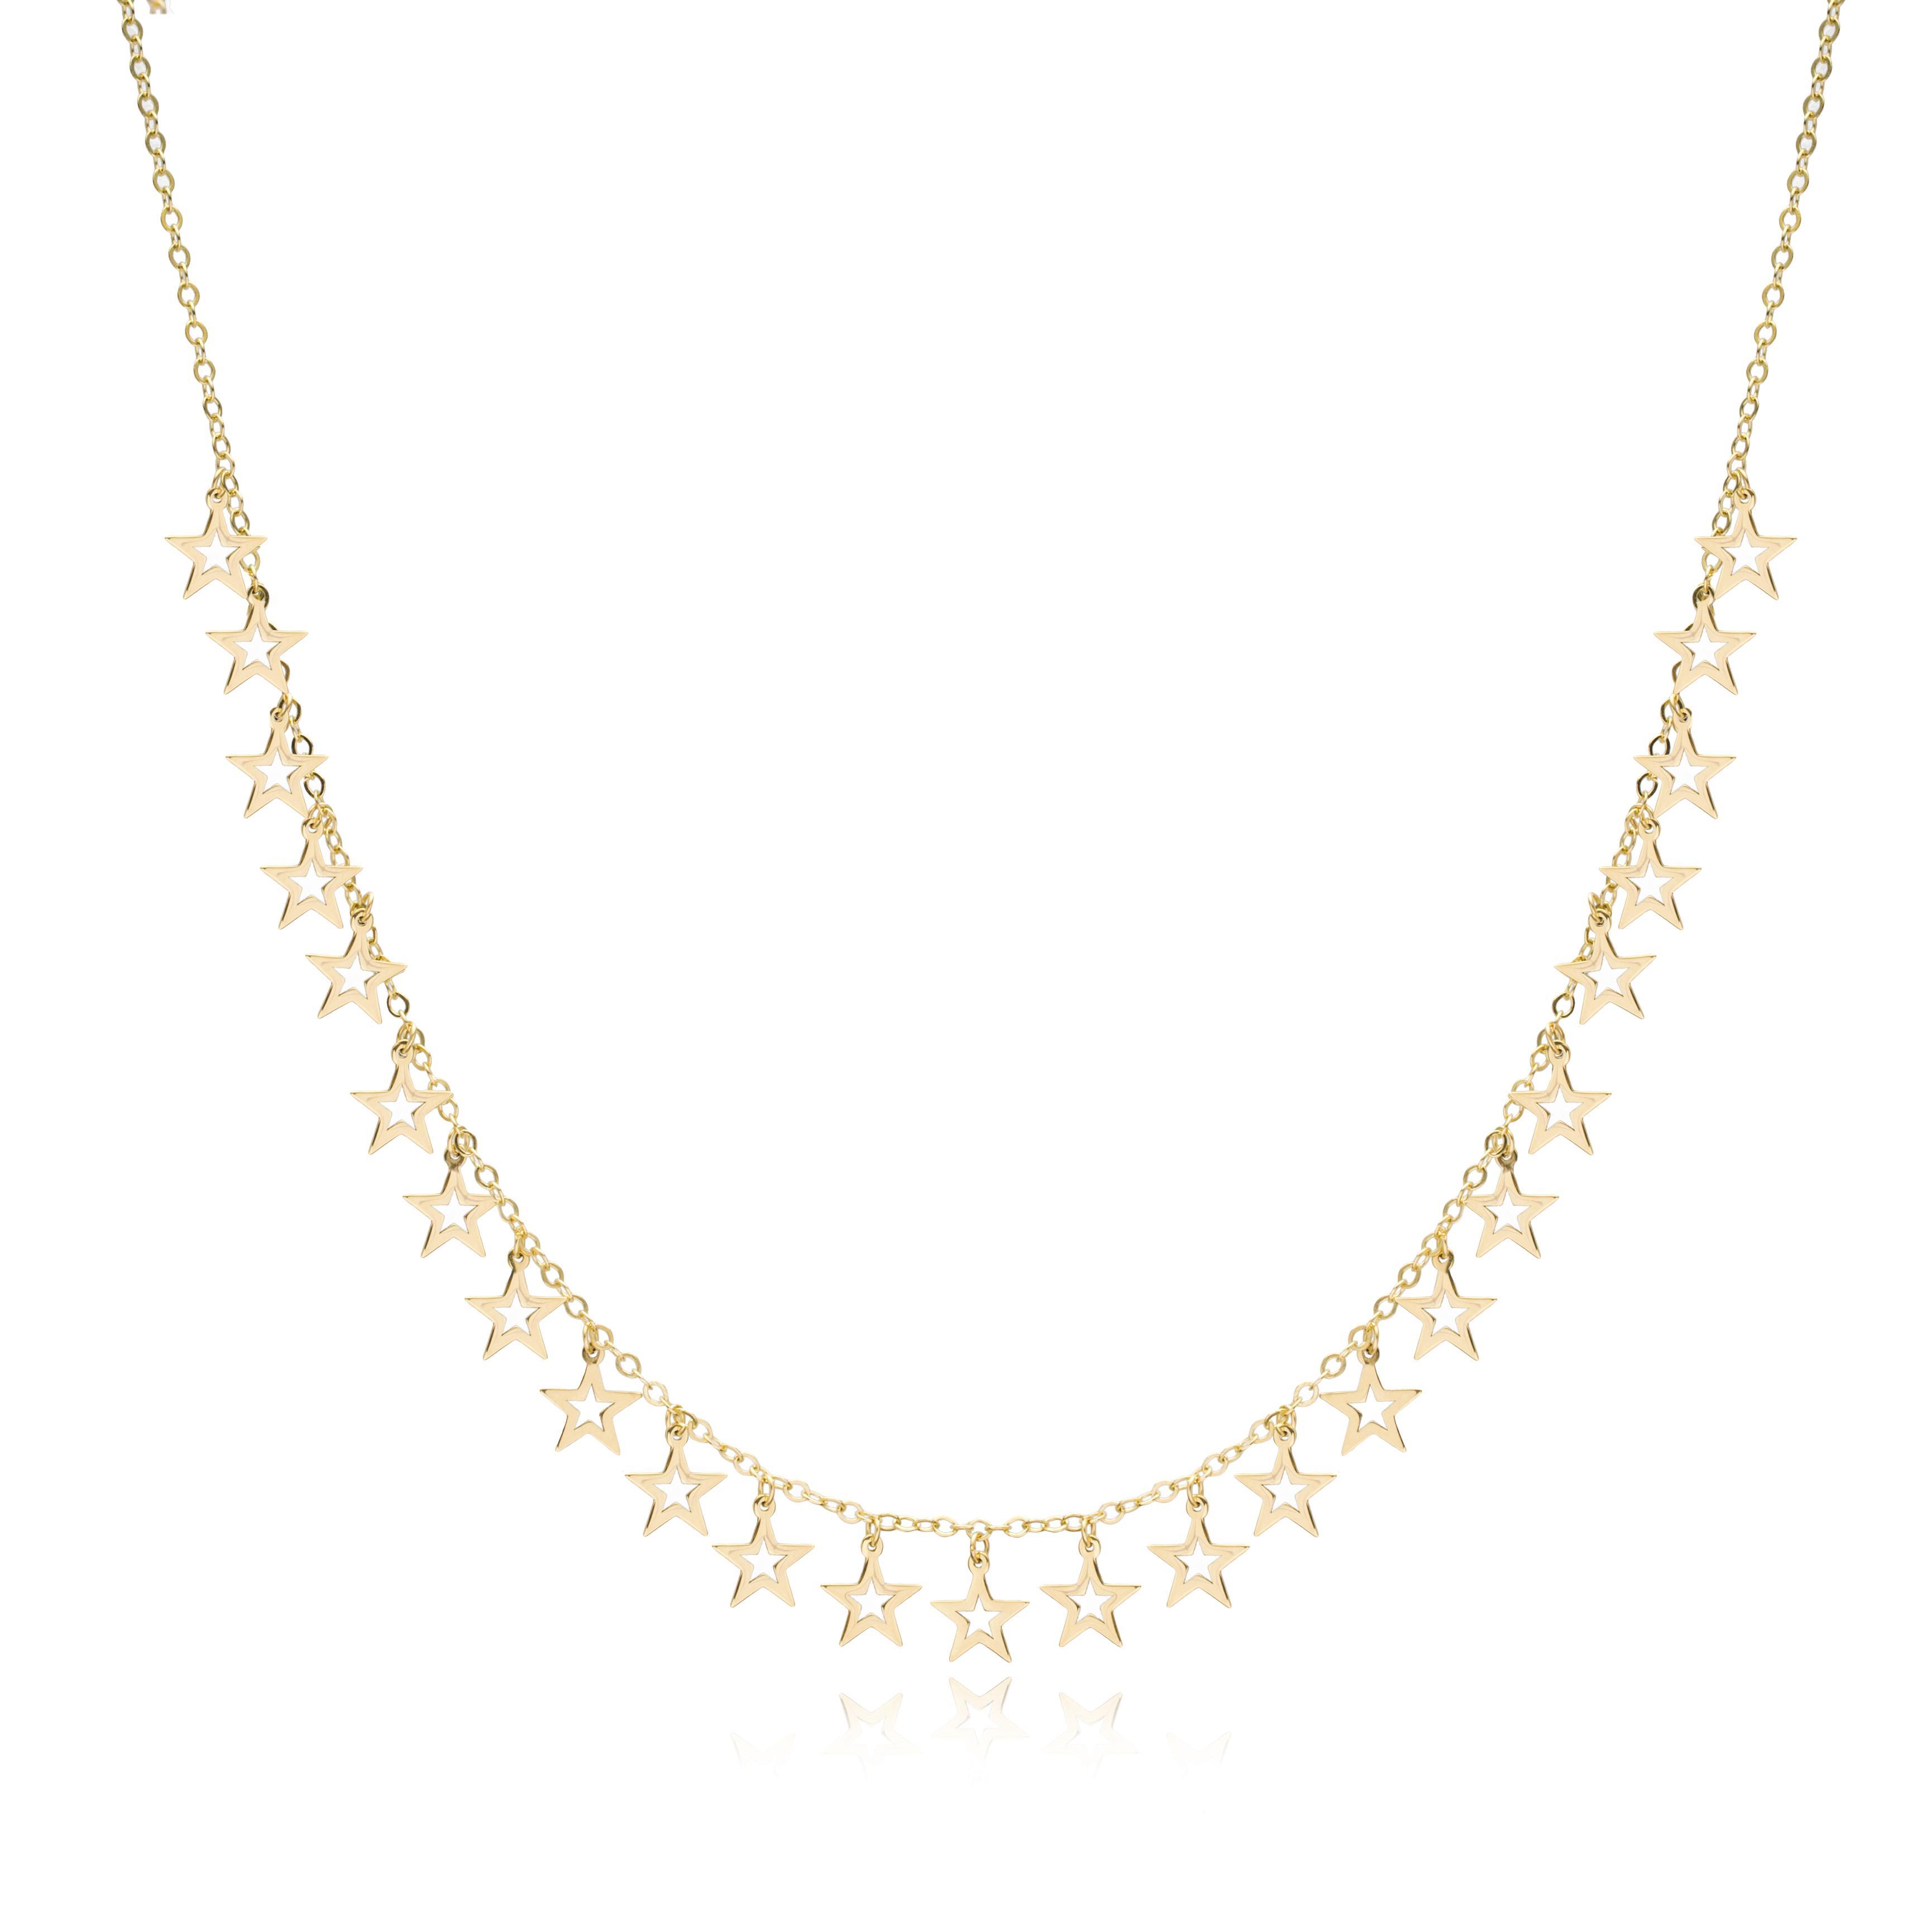 10K Gold Elegant Shaker Star Pendant Wholesale Handmade Turkish Jewelry